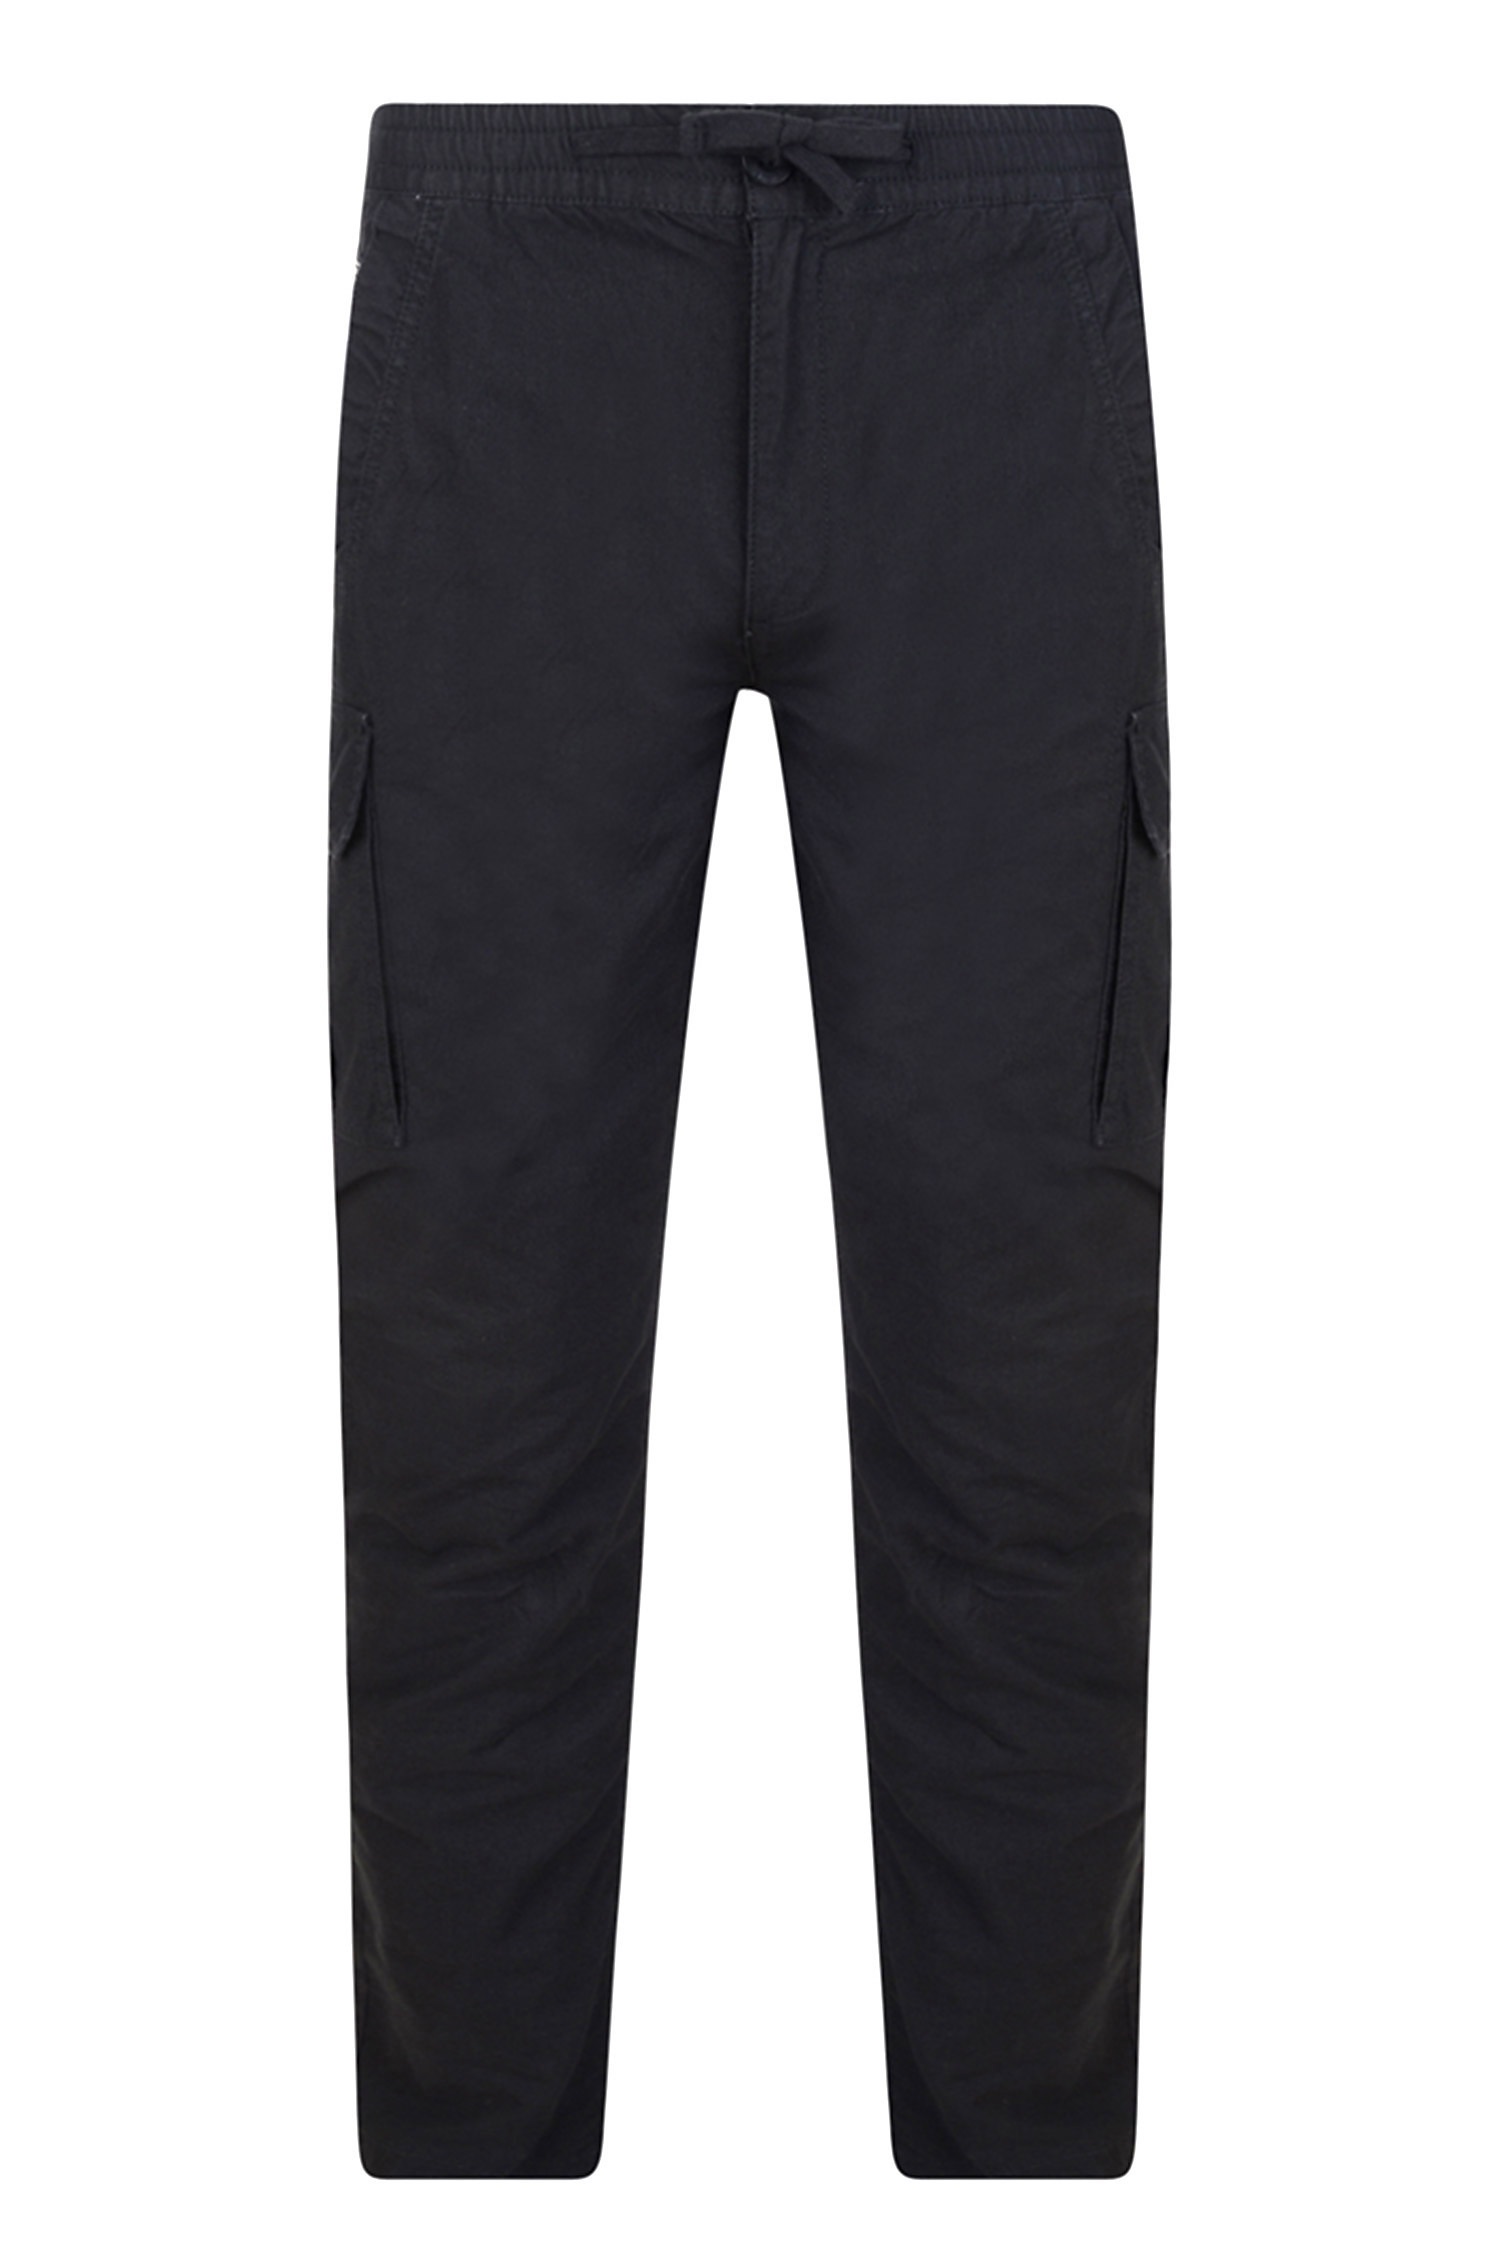 Pantalones, Sport, 109412, NEGRO | Zoom